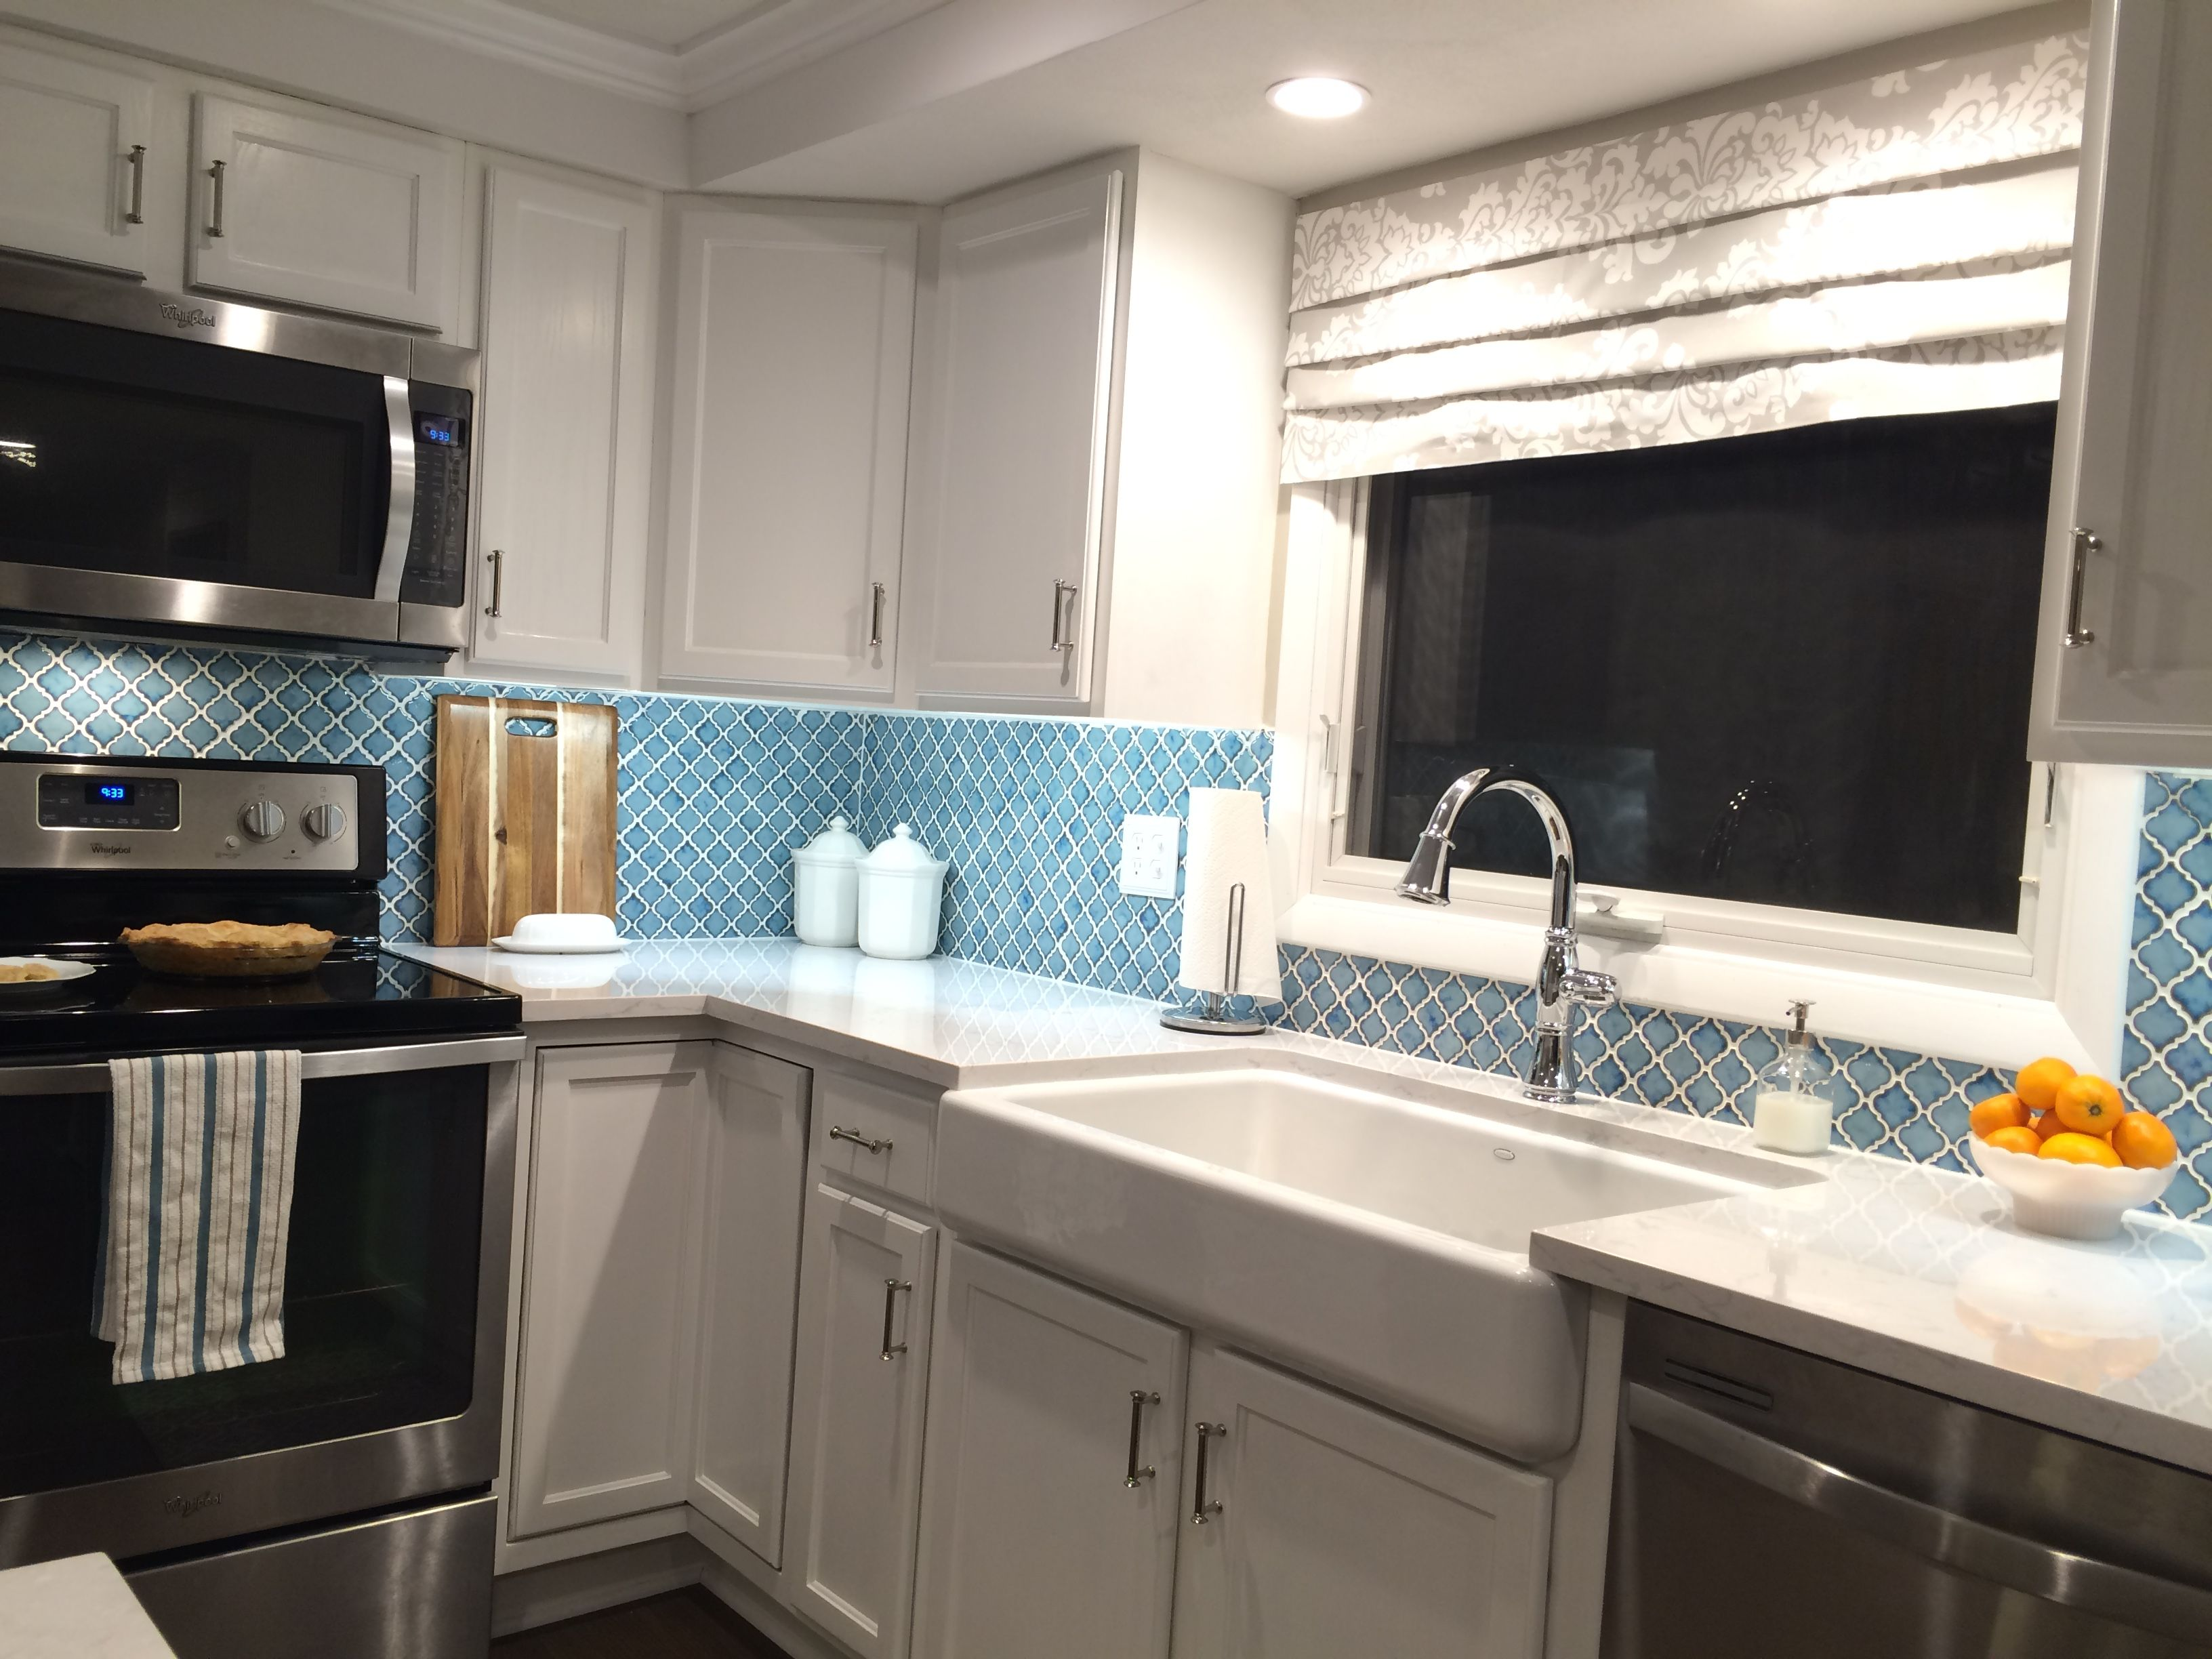 White Kitchen With Turquoise Backsplash Tile Wayfair Pharsalia Porcelain In Marine